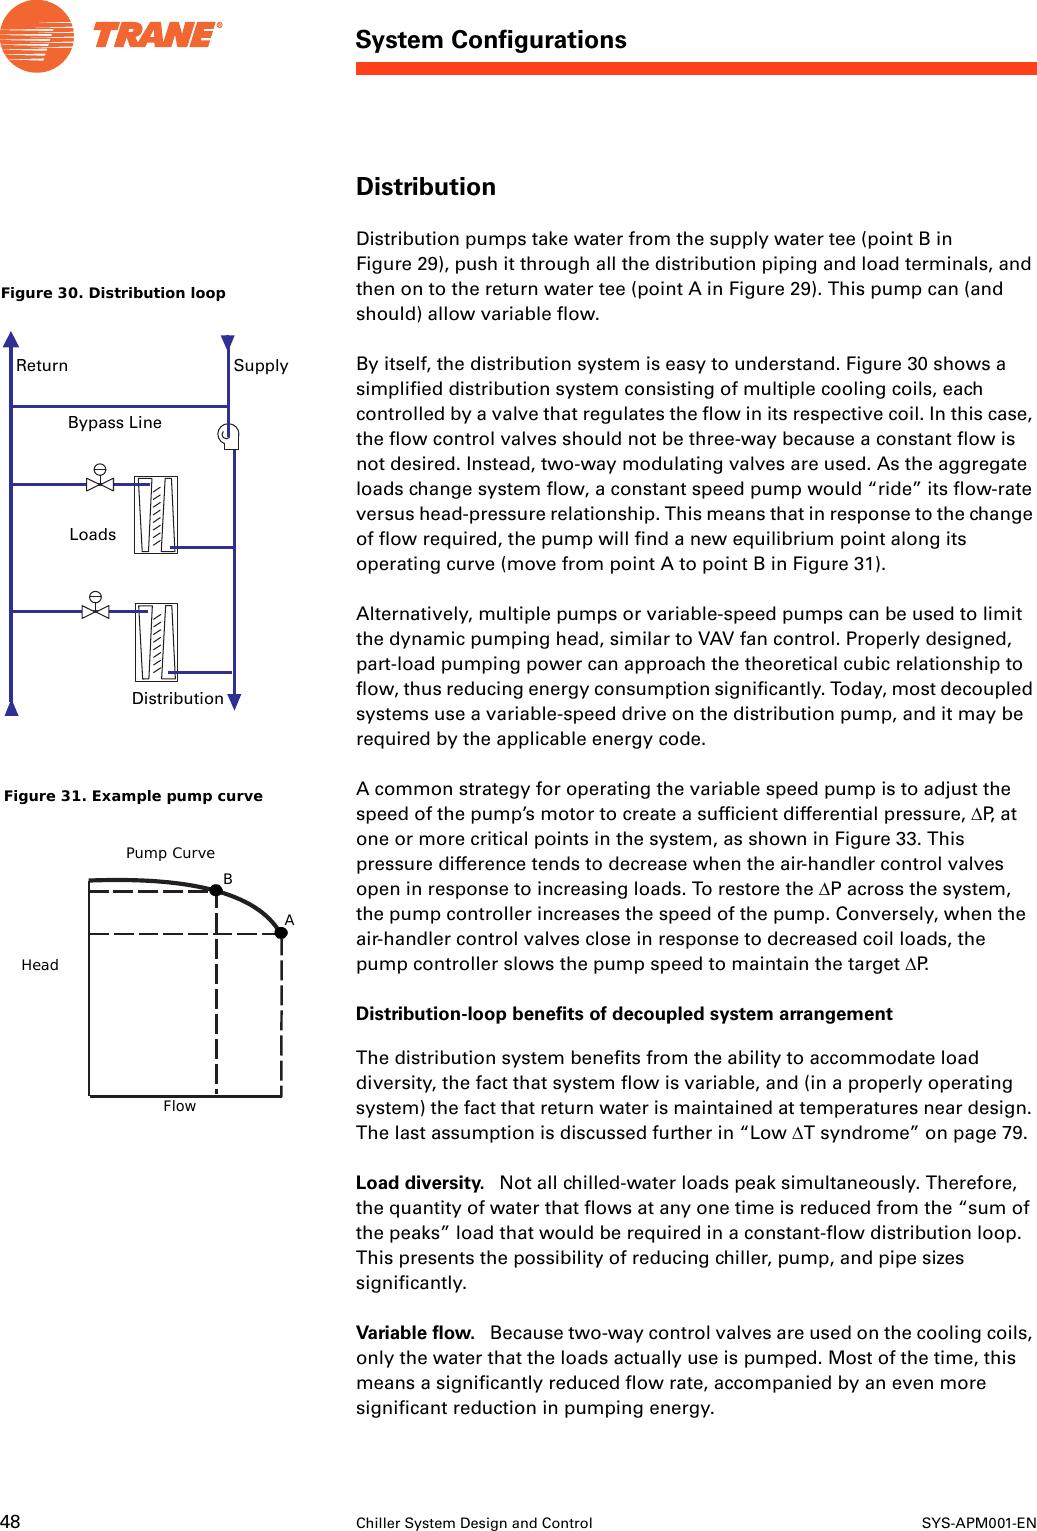 Trane Sys Apm001 En Users Manual 05/05/2009 Chiller System Design